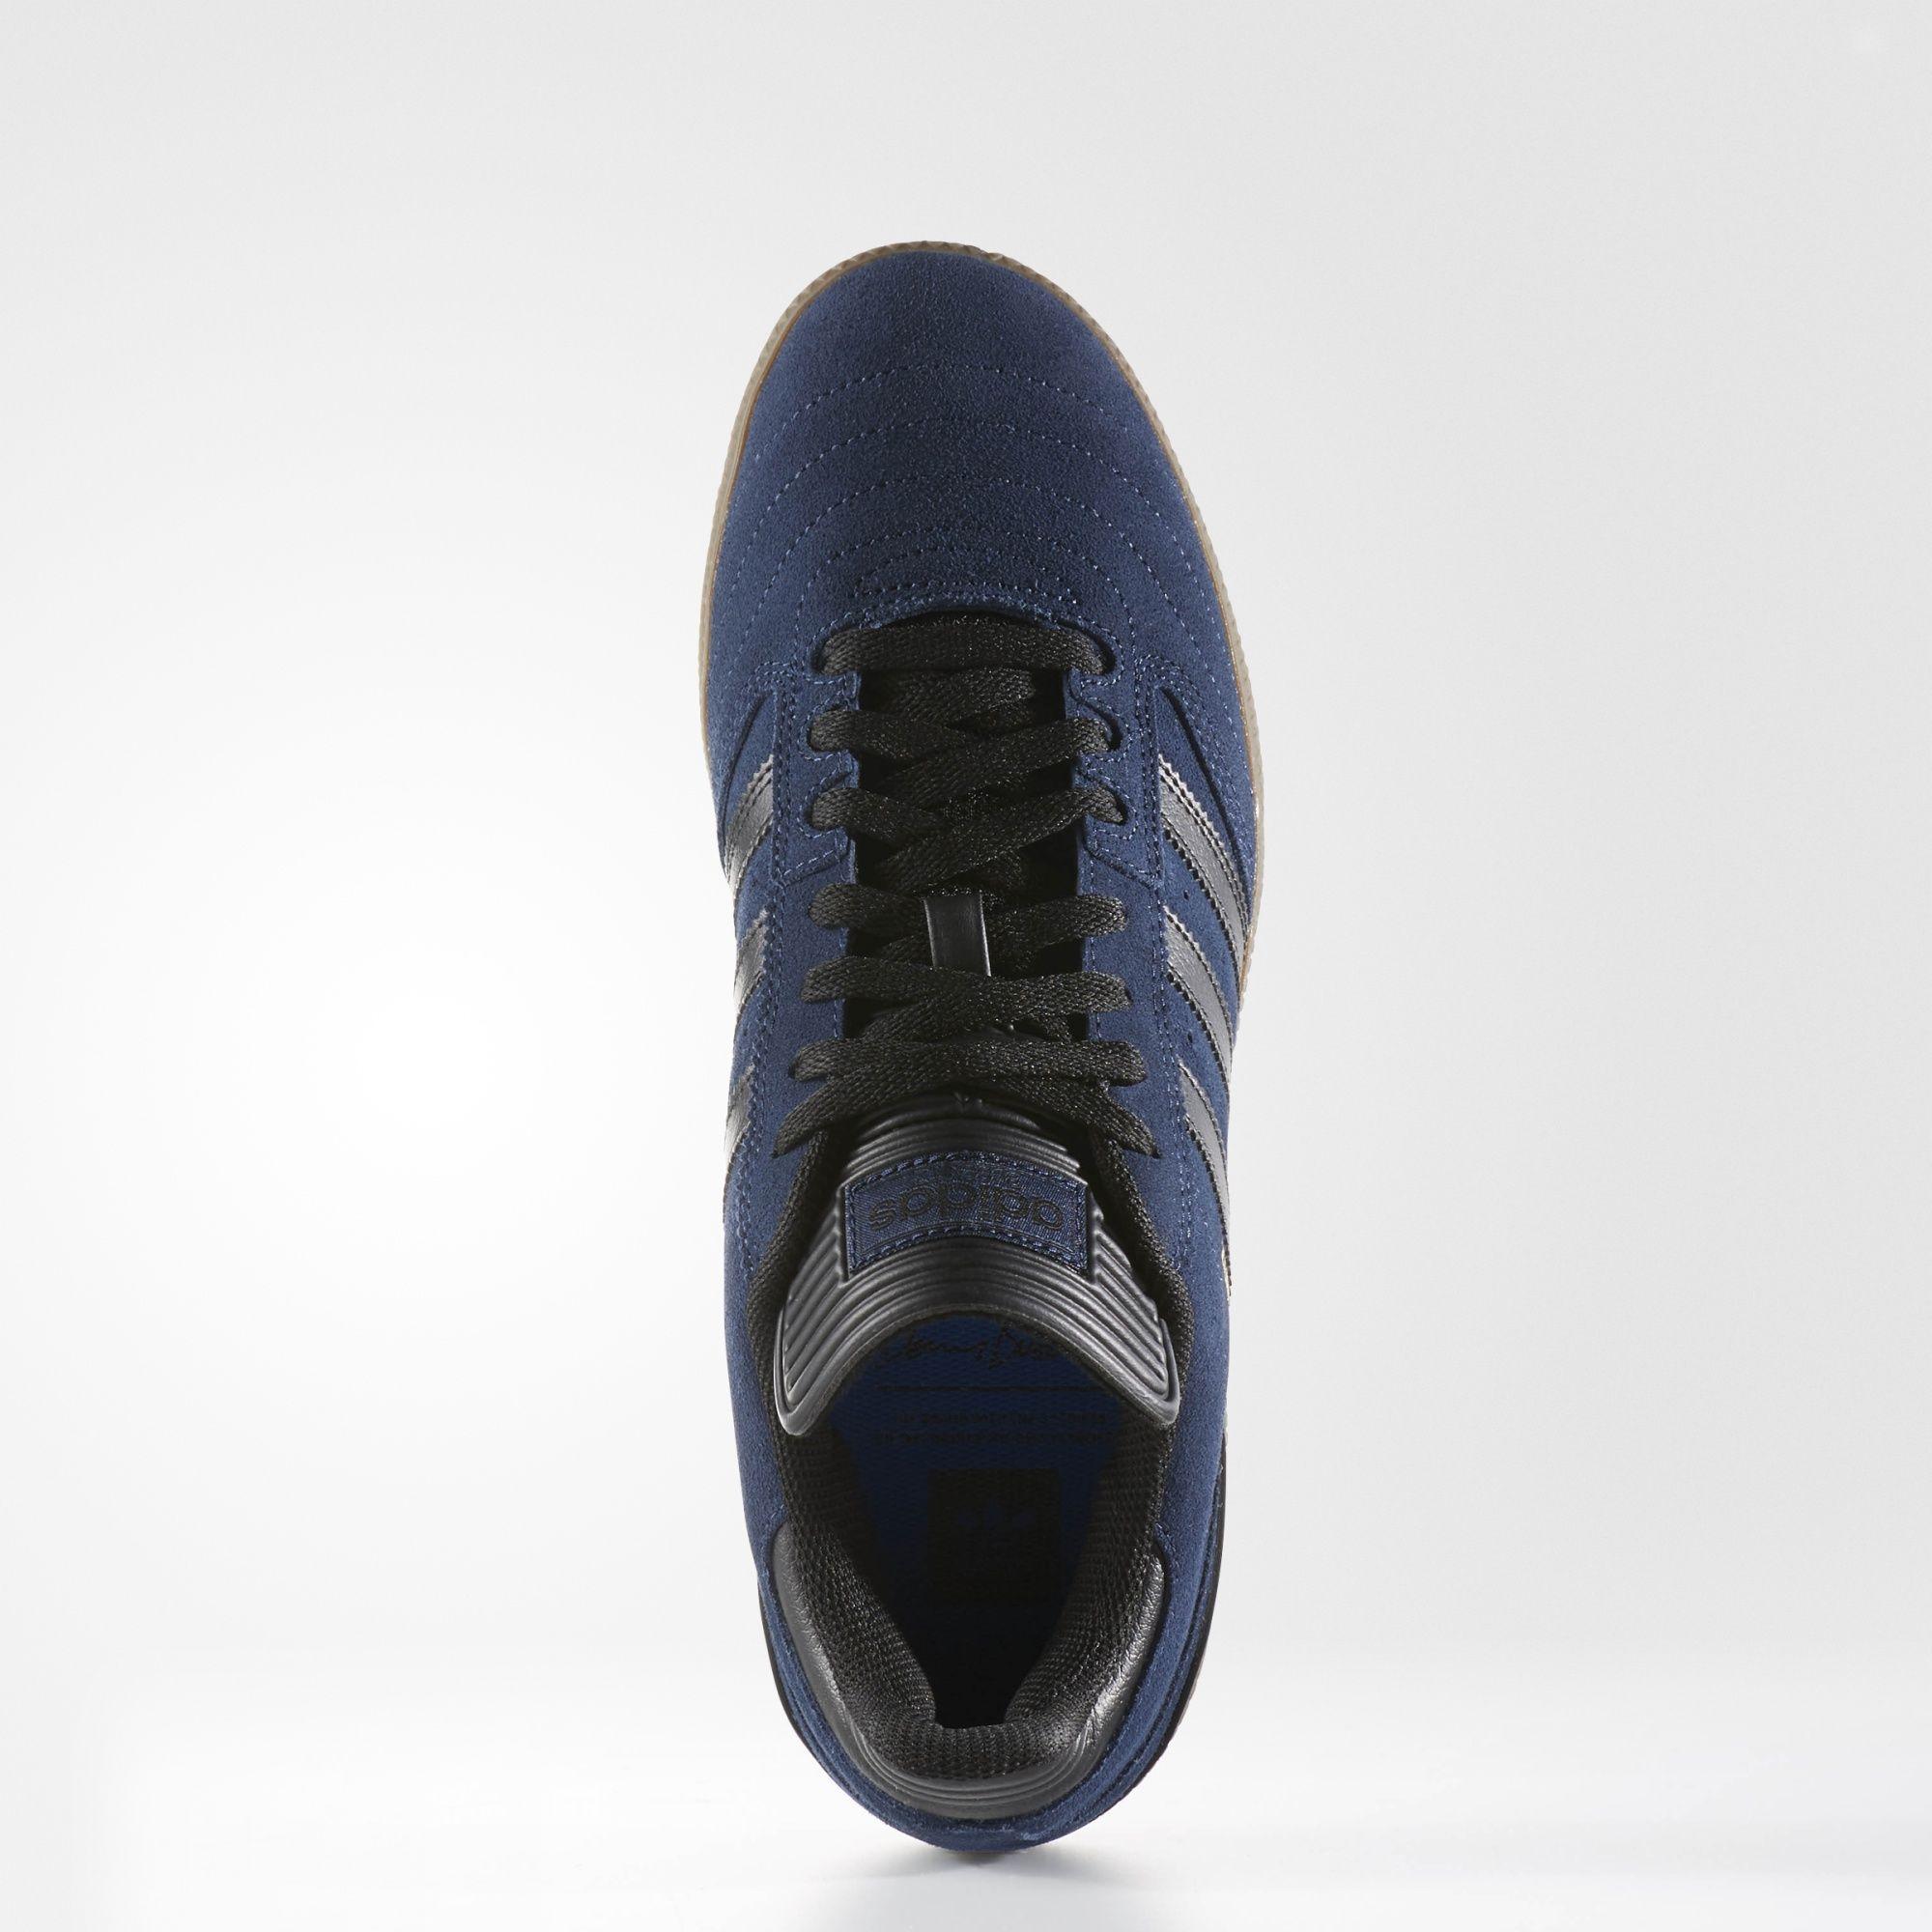 adidas - Busenitz Pro Schuh    3 Schuhe  3   Pinterest   Adidas ... 3e5f653f82